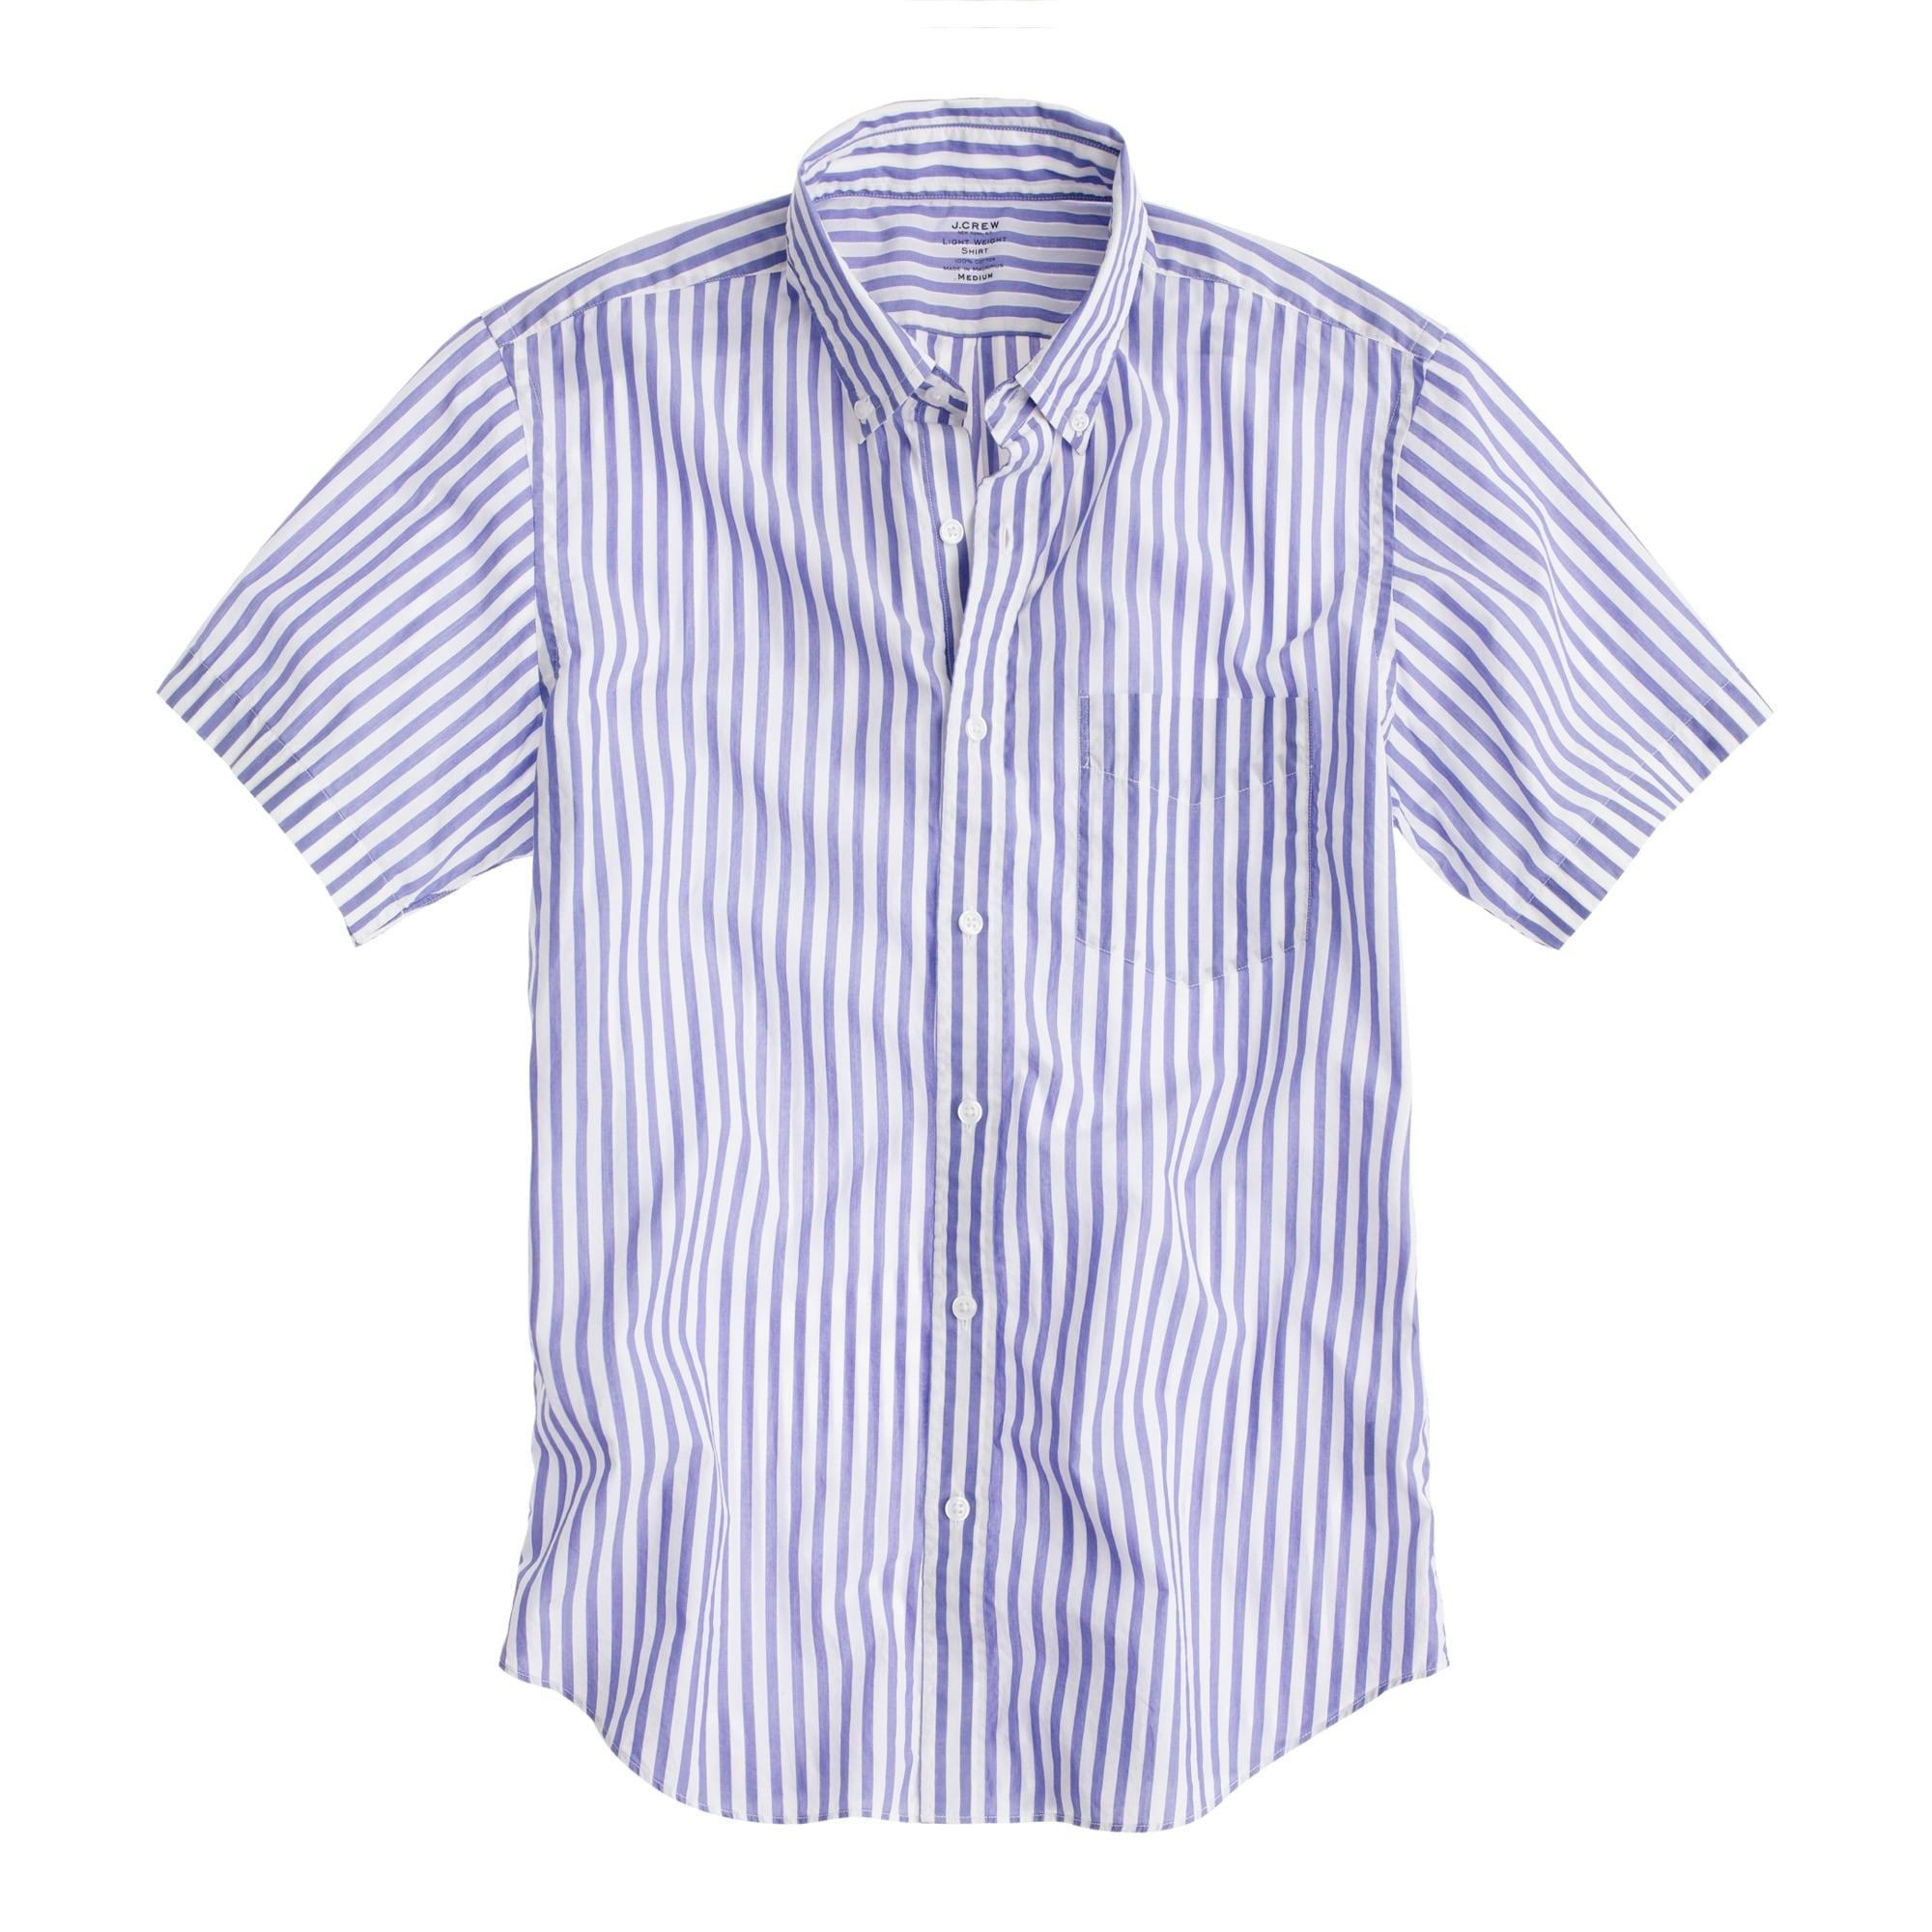 Secret Wash lightweight short-sleeve shirt in sea stripe